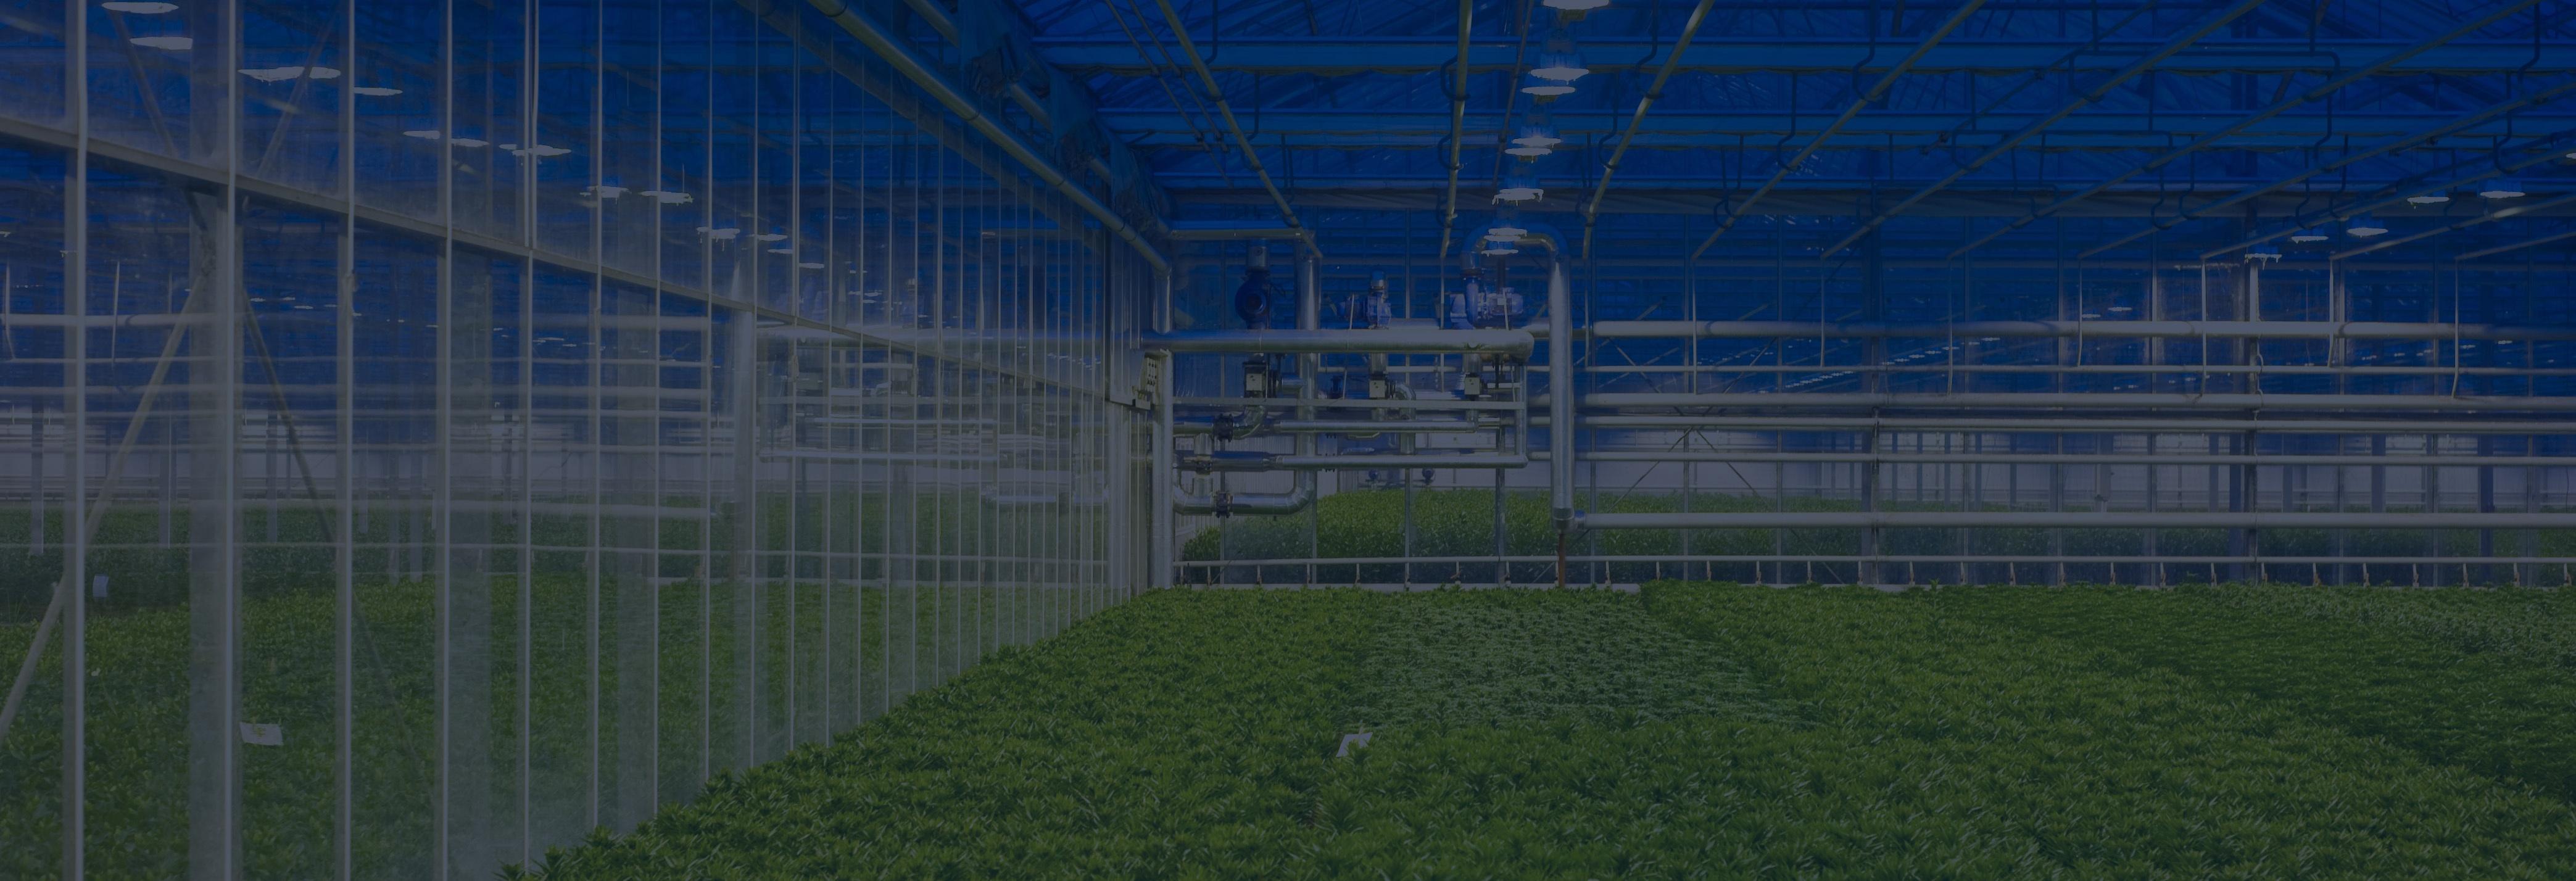 greenhouse_banner-2.jpg